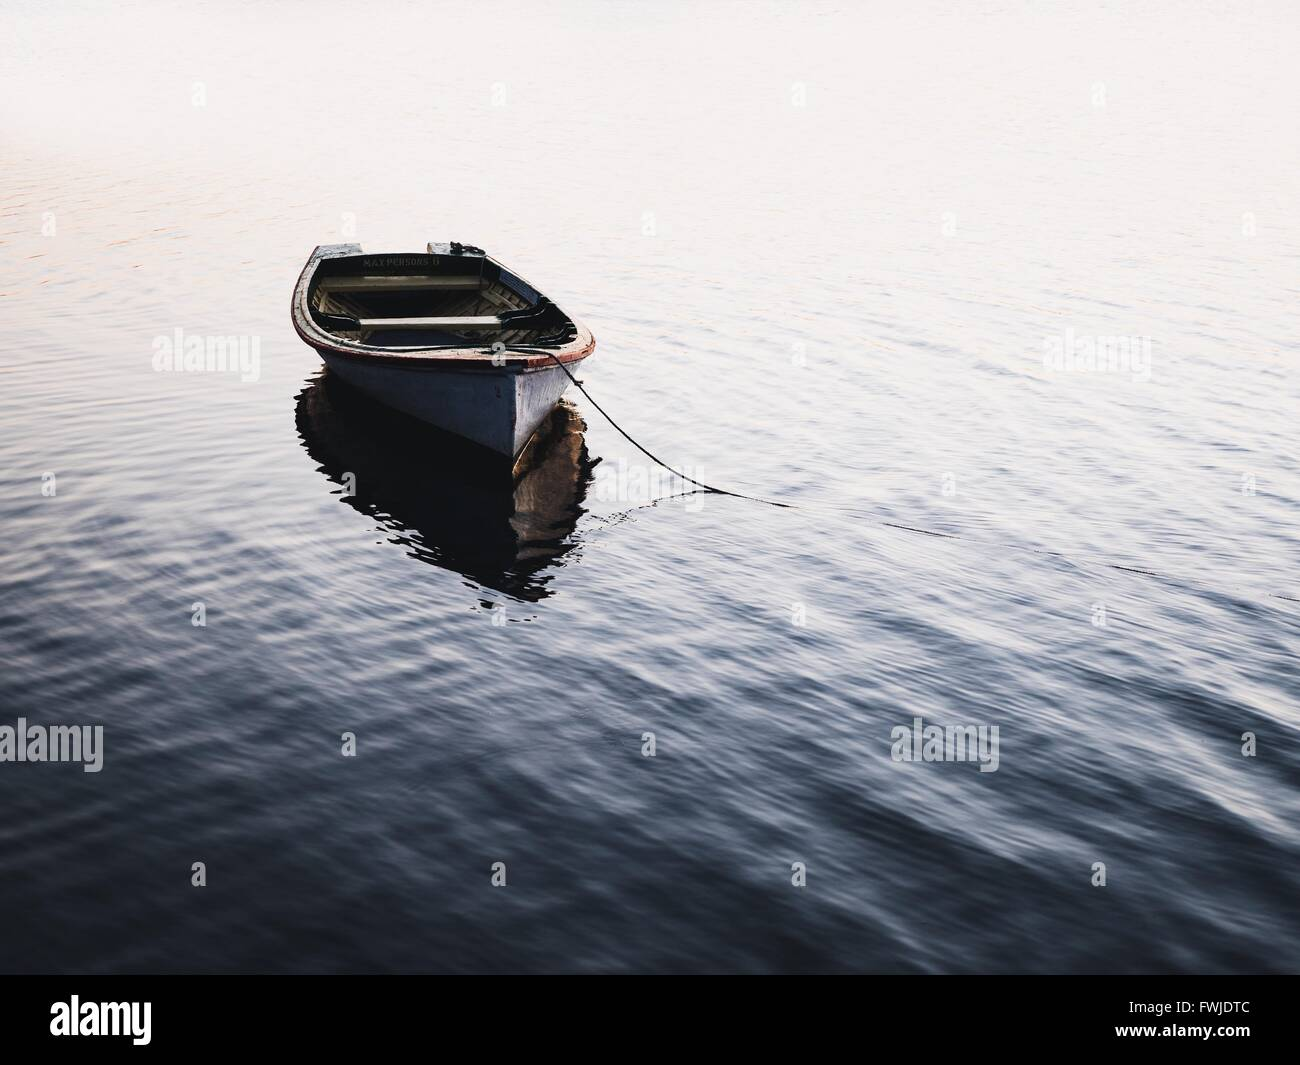 Boat Moored On Lake - Stock Image